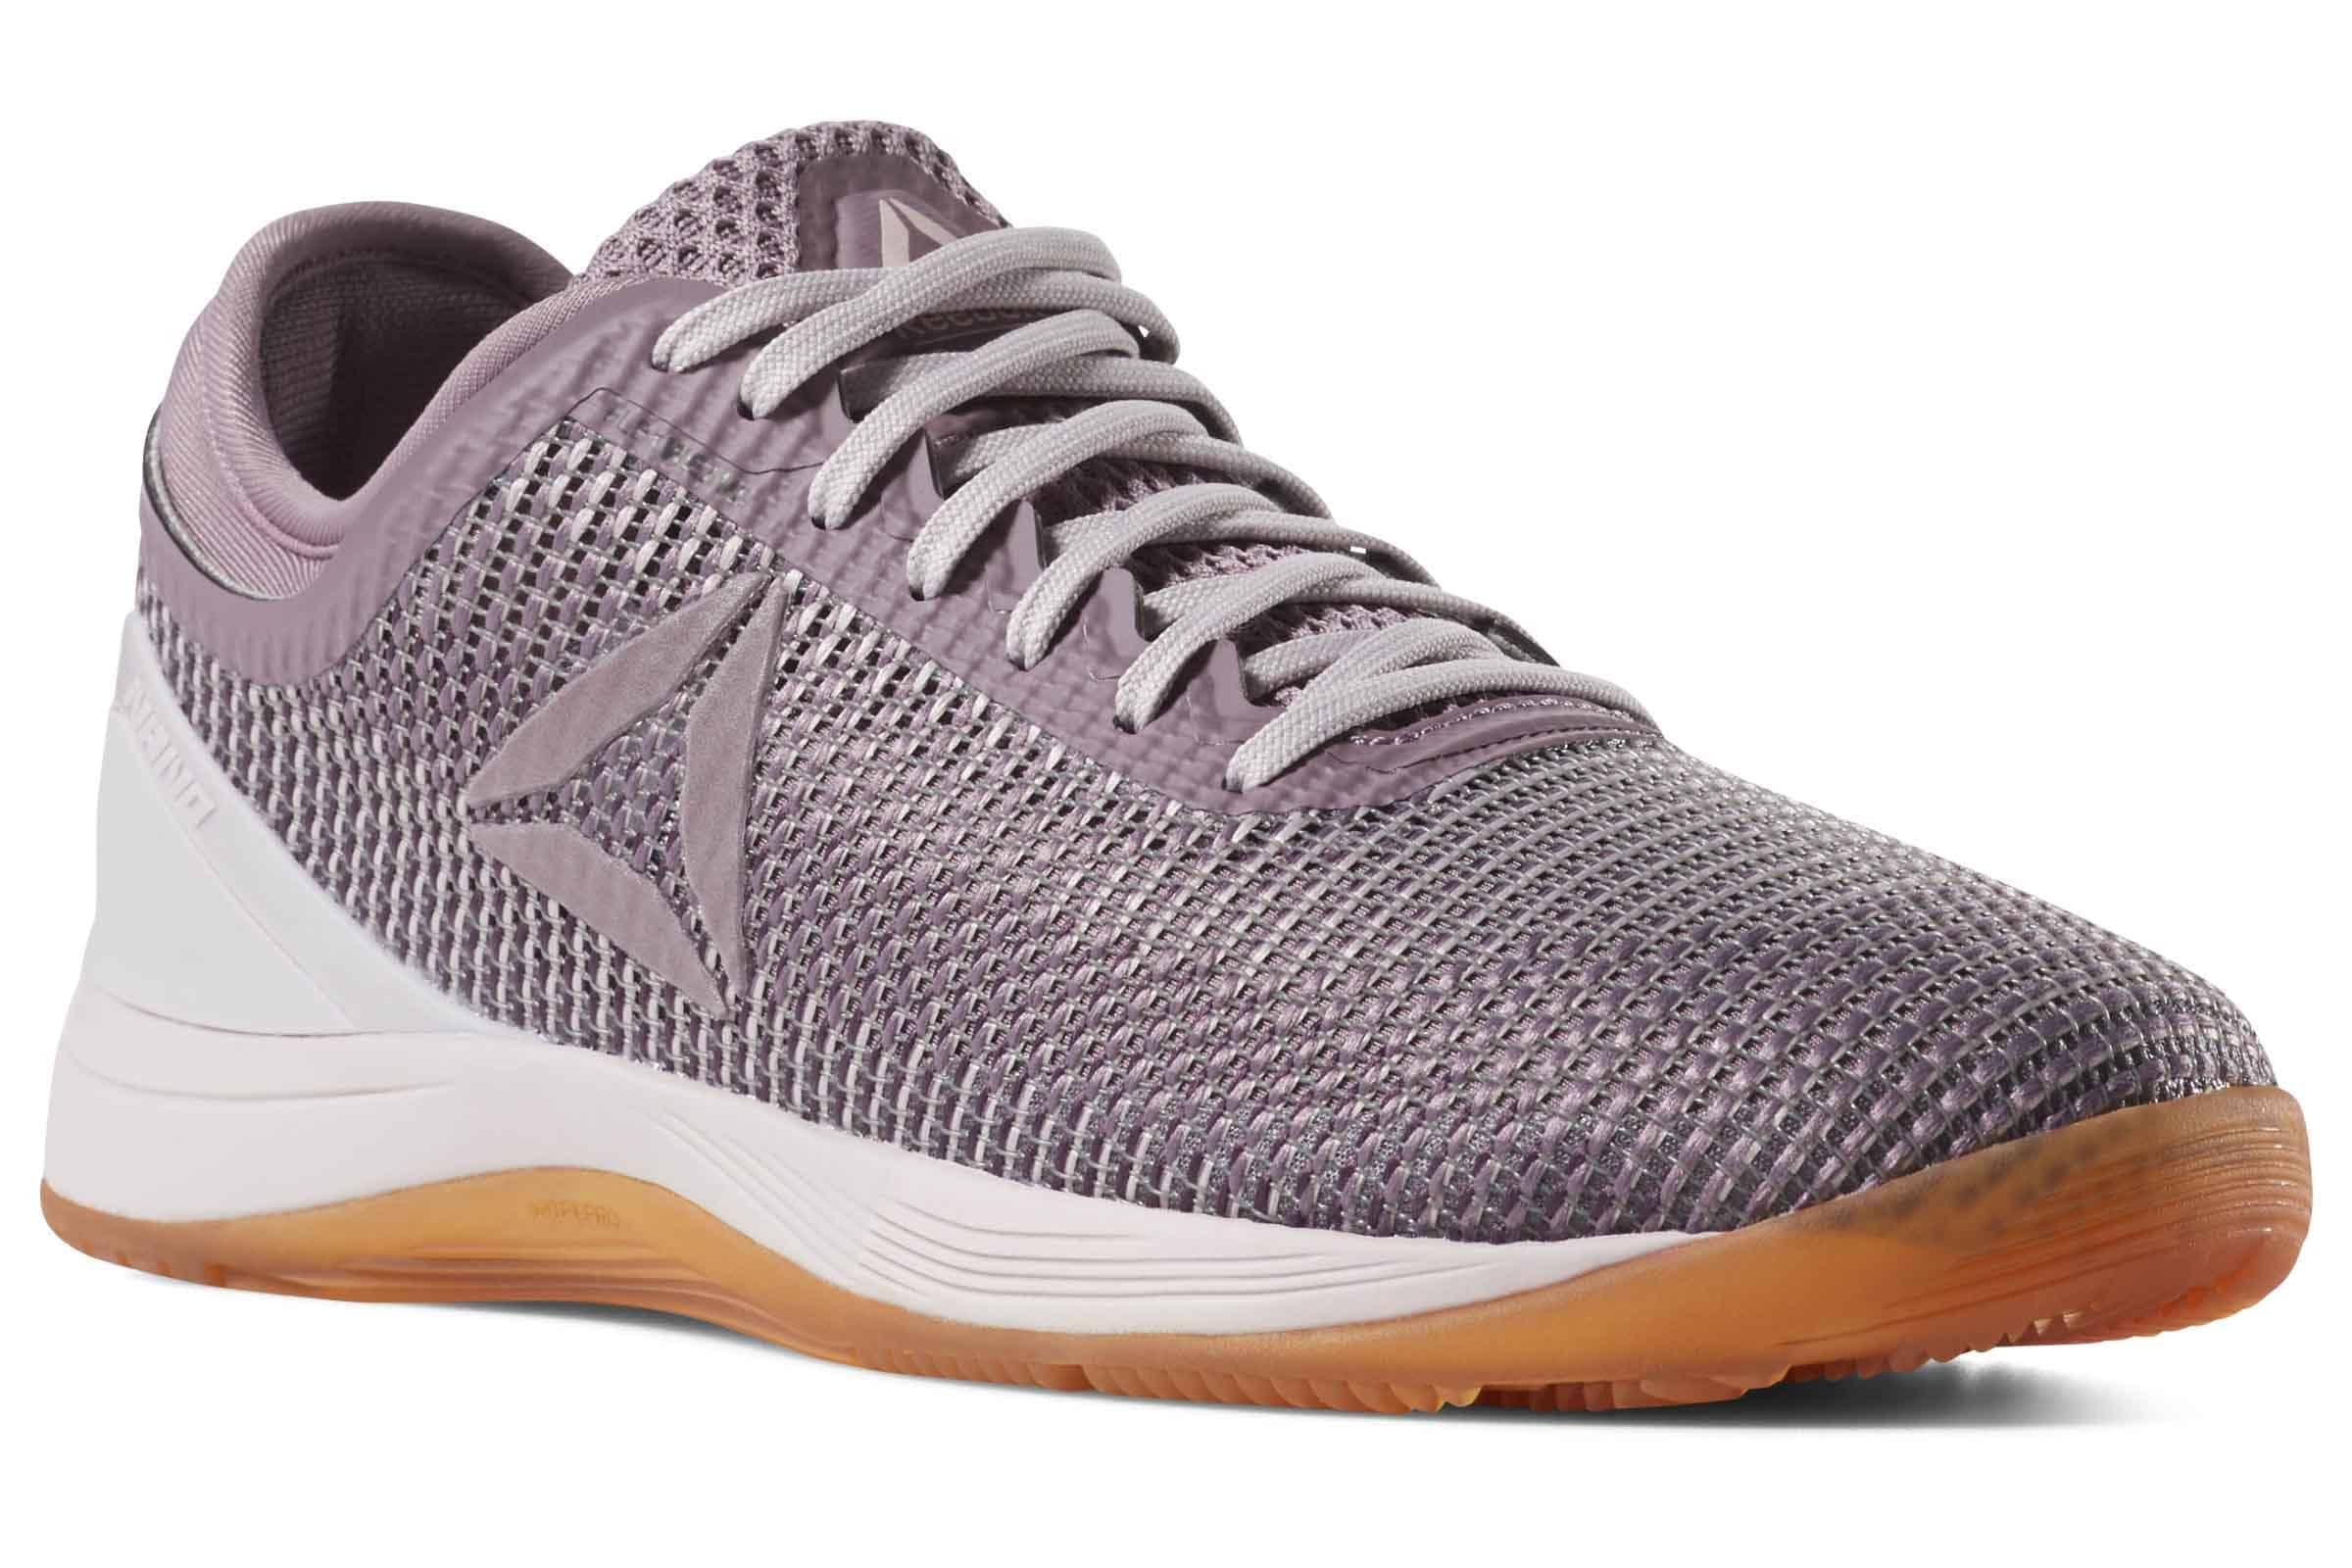 Best Looking Reebok Training Shoes for men Reebok CrossFit